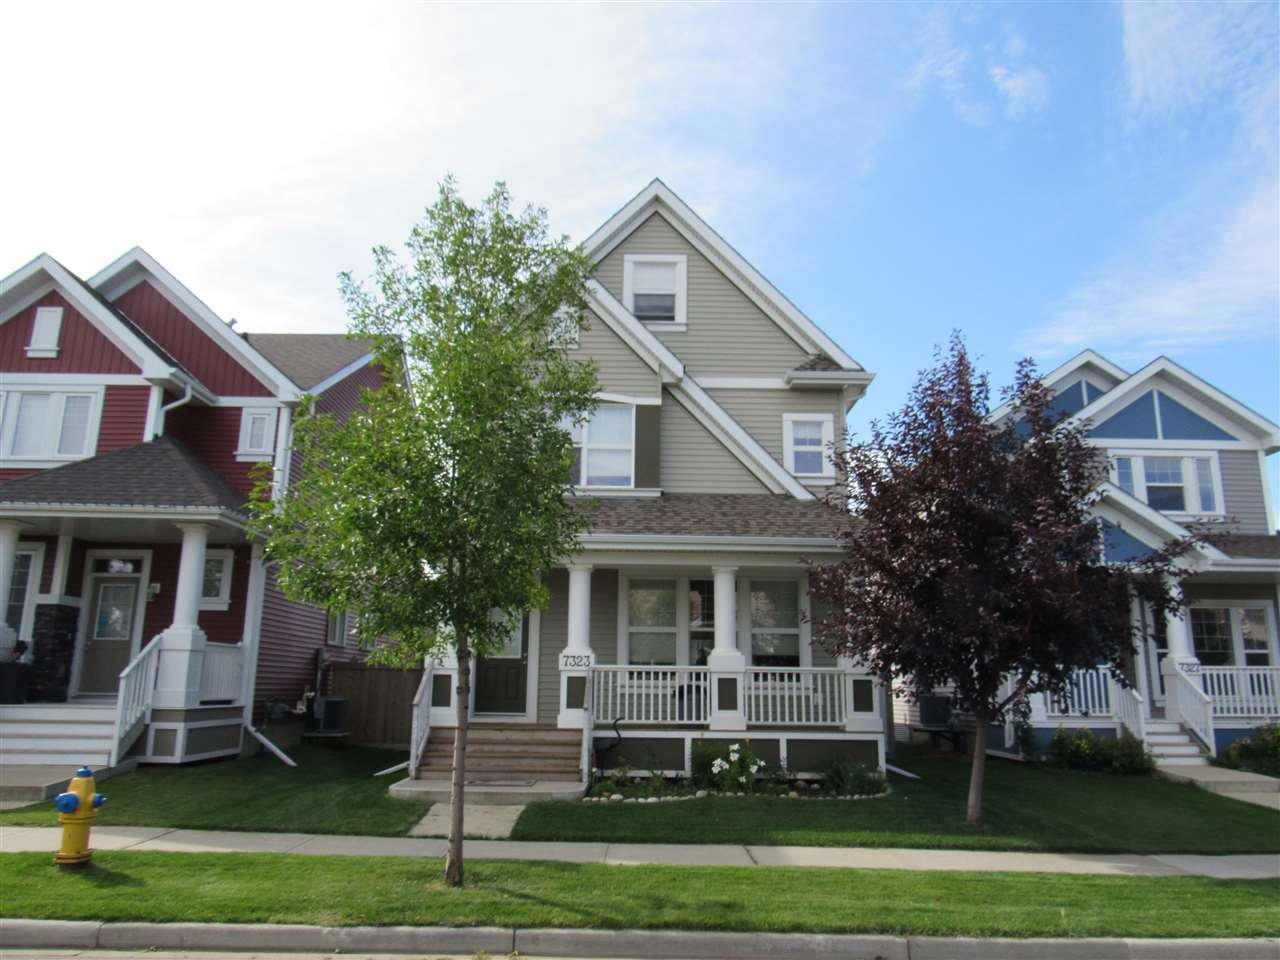 Main Photo: 7323 21 Avenue in Edmonton: Zone 53 House for sale : MLS®# E4204430